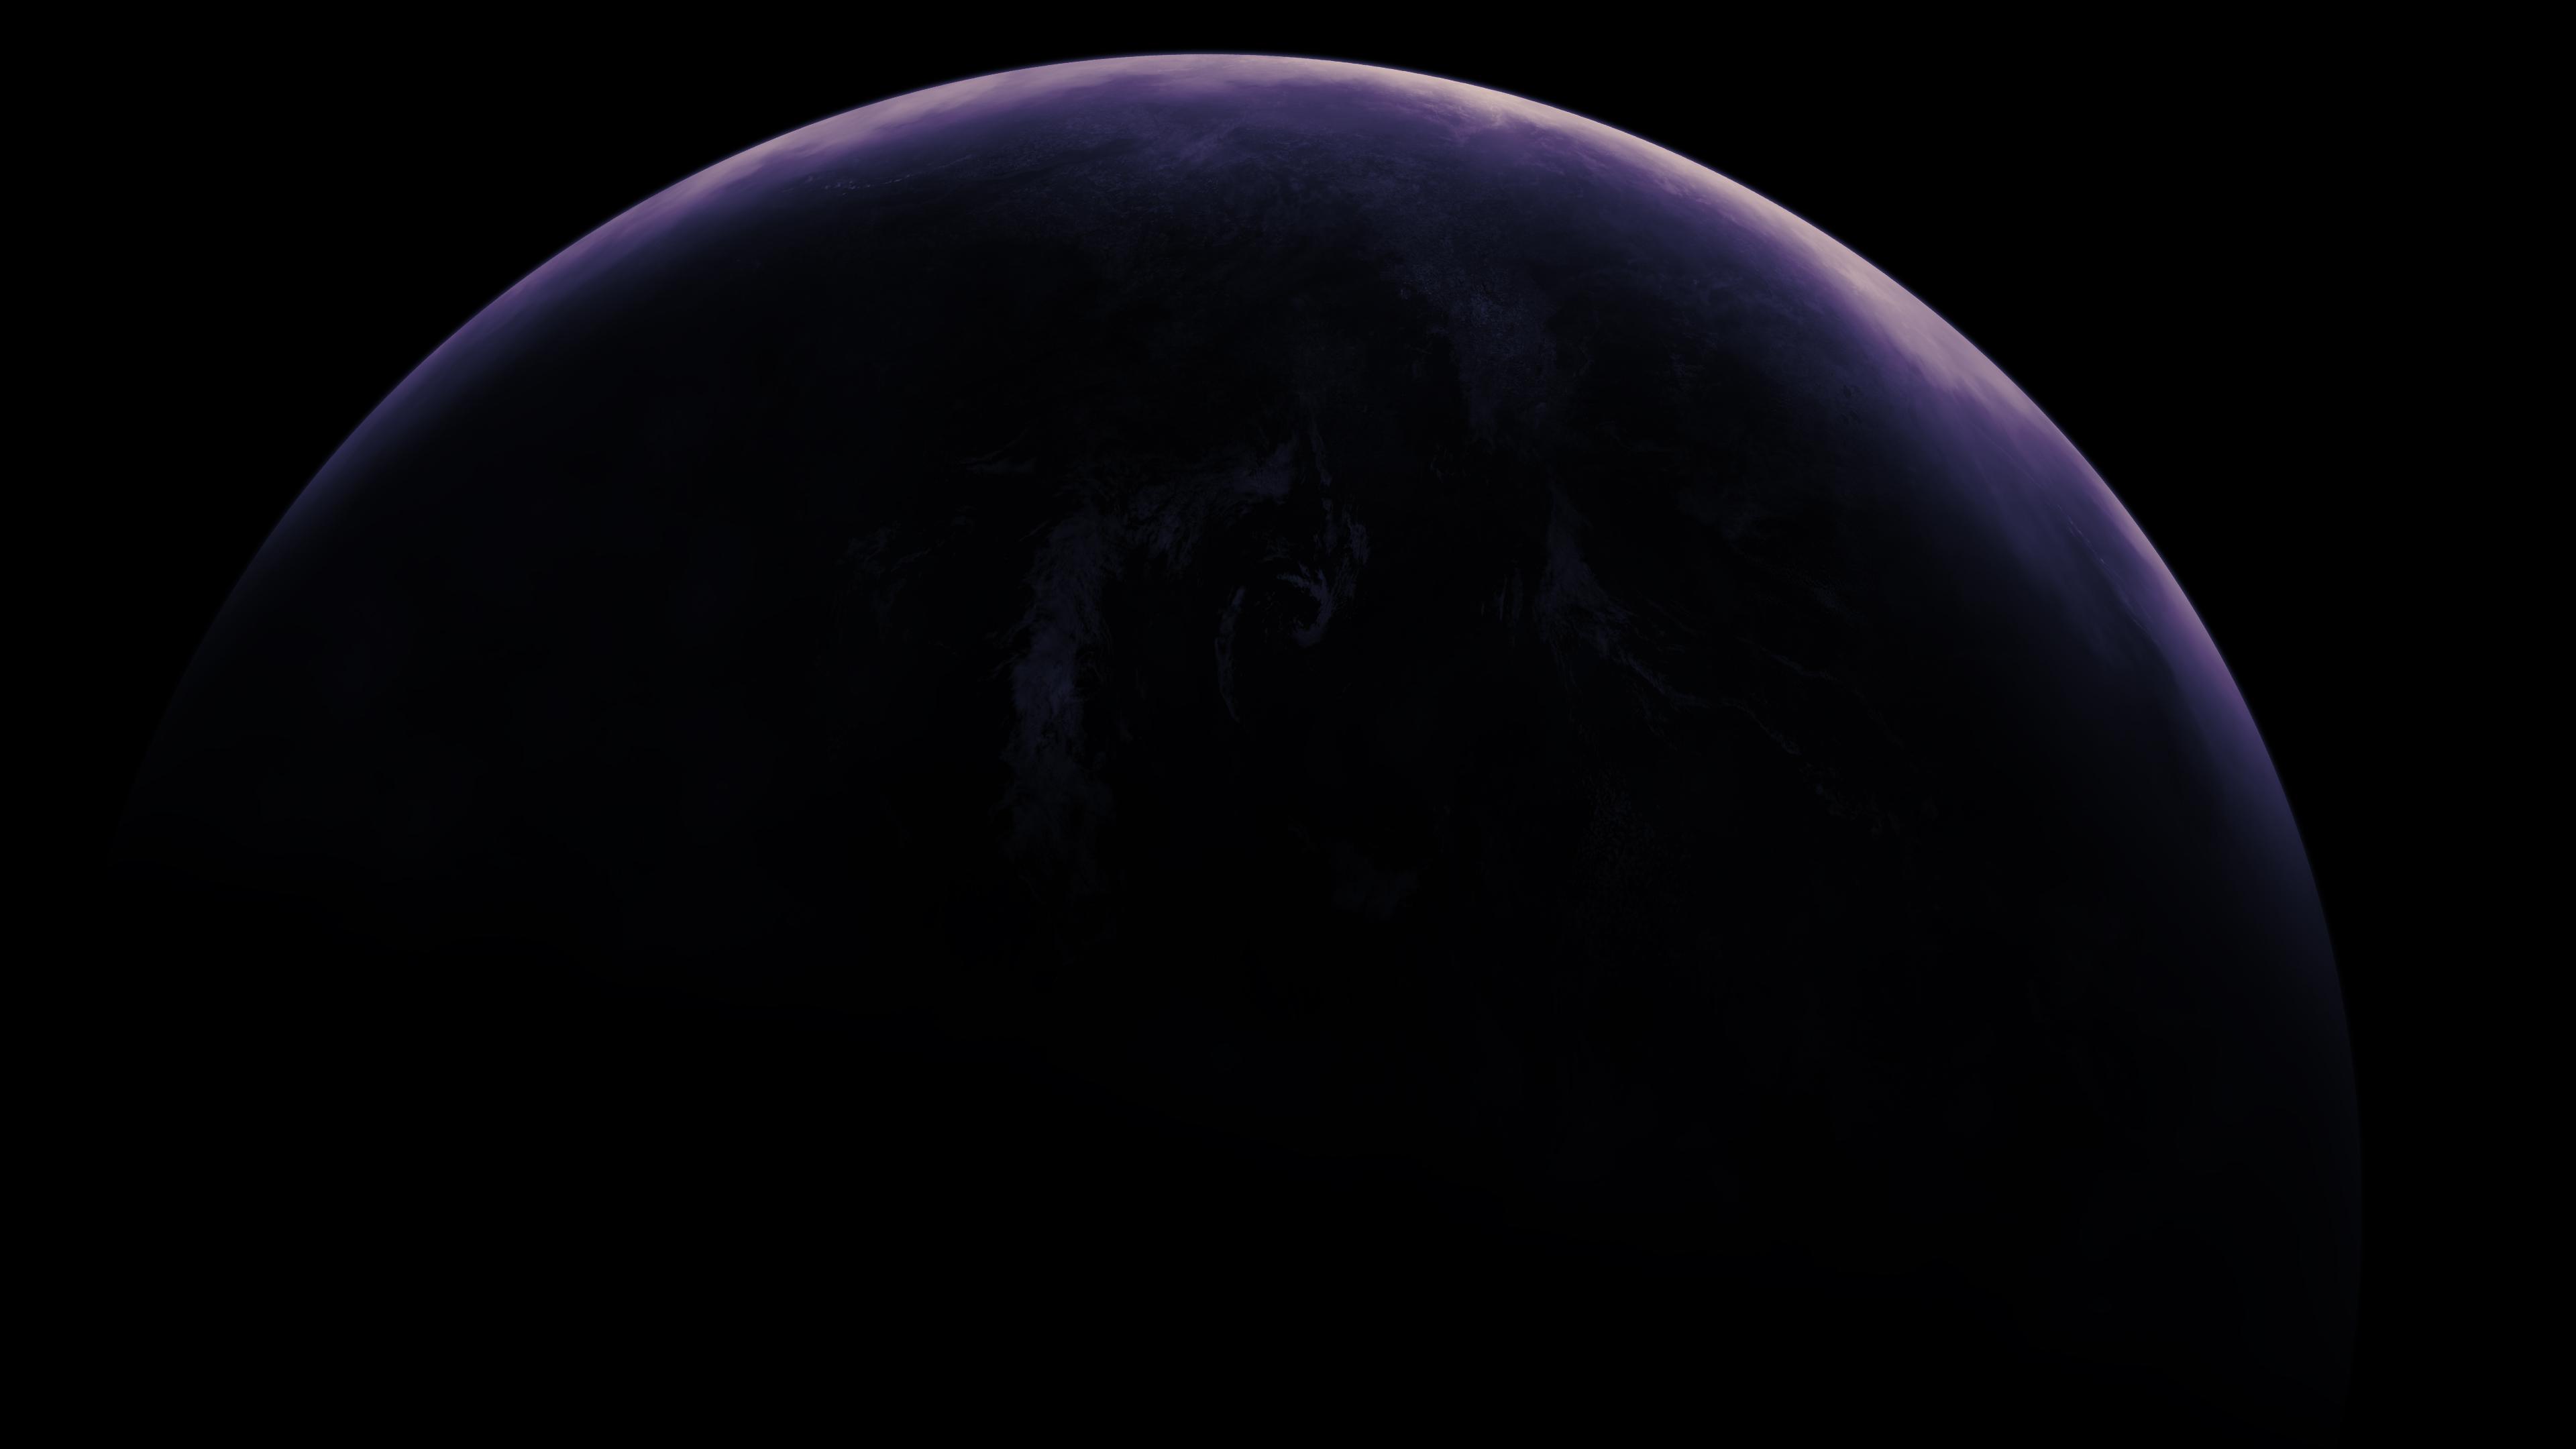 planet curve 4k 1546279208 - Planet Curve 4k - planet wallpapers, hd-wallpapers, digital universe wallpapers, deviantart wallpapers, 4k-wallpapers